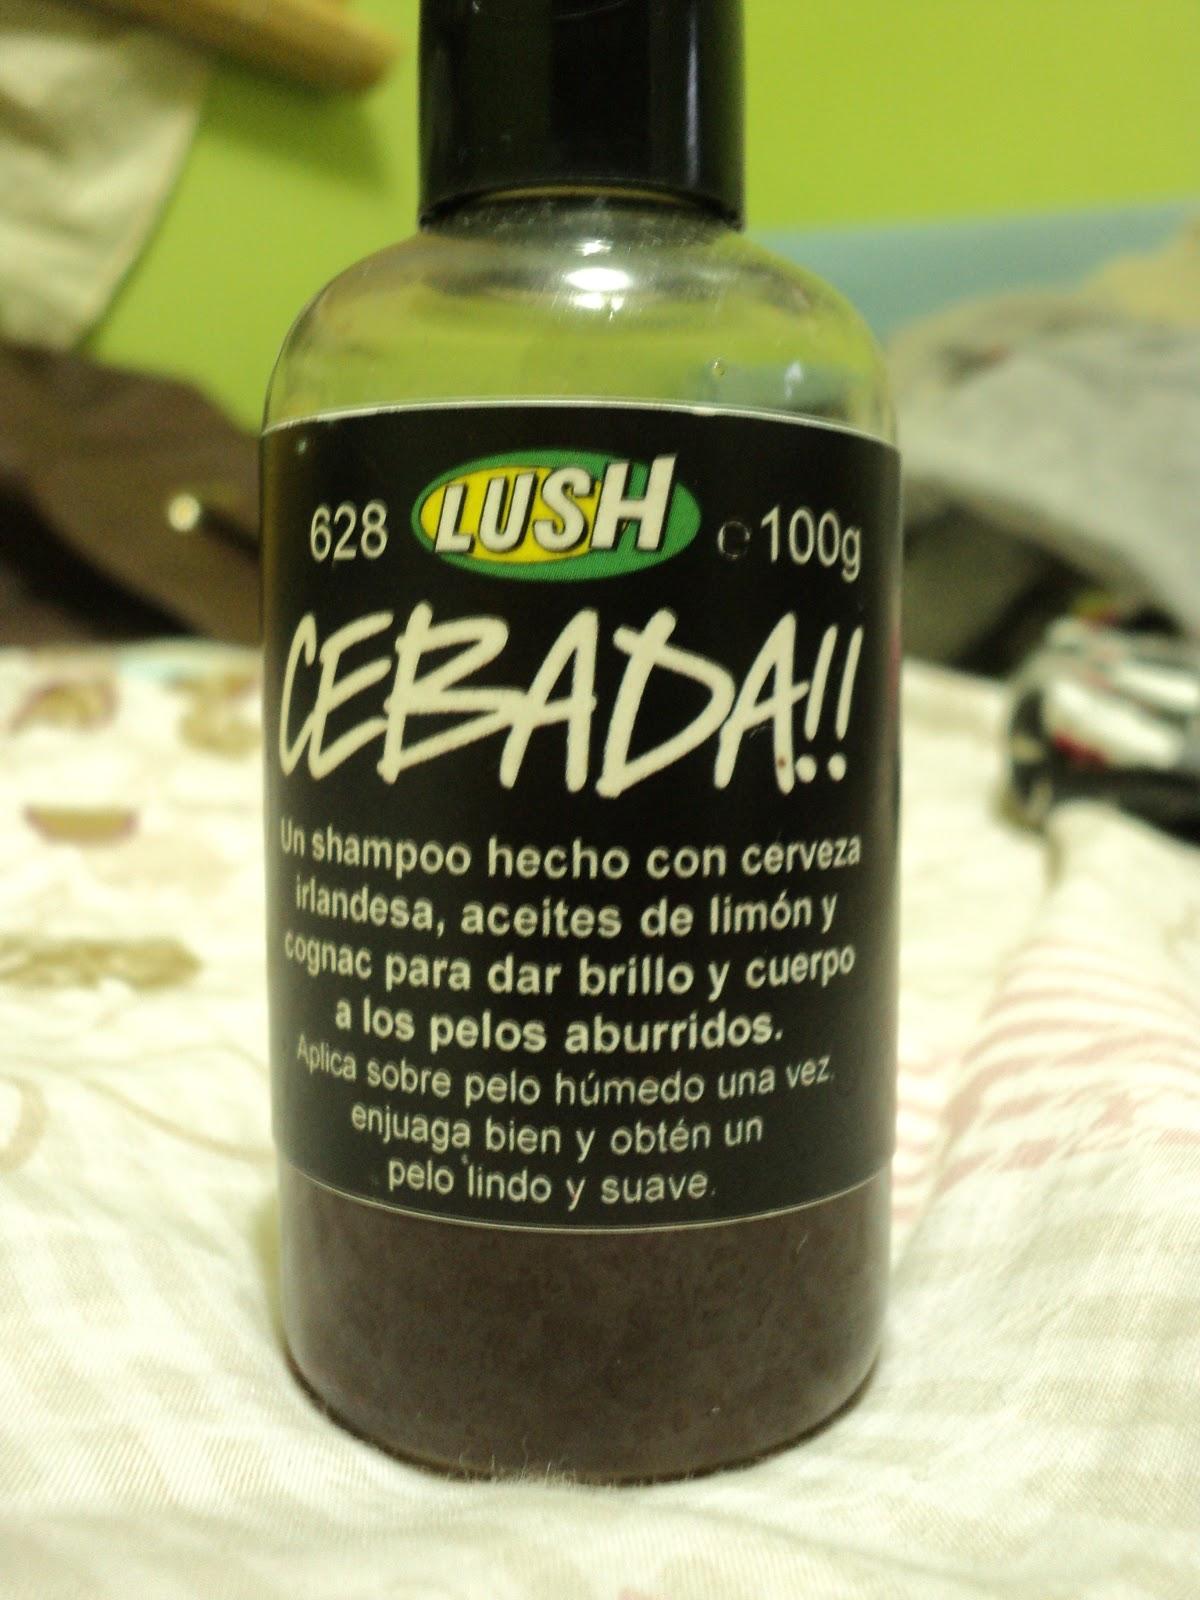 Flying like the birds: Shampoo CEBADA de Lush